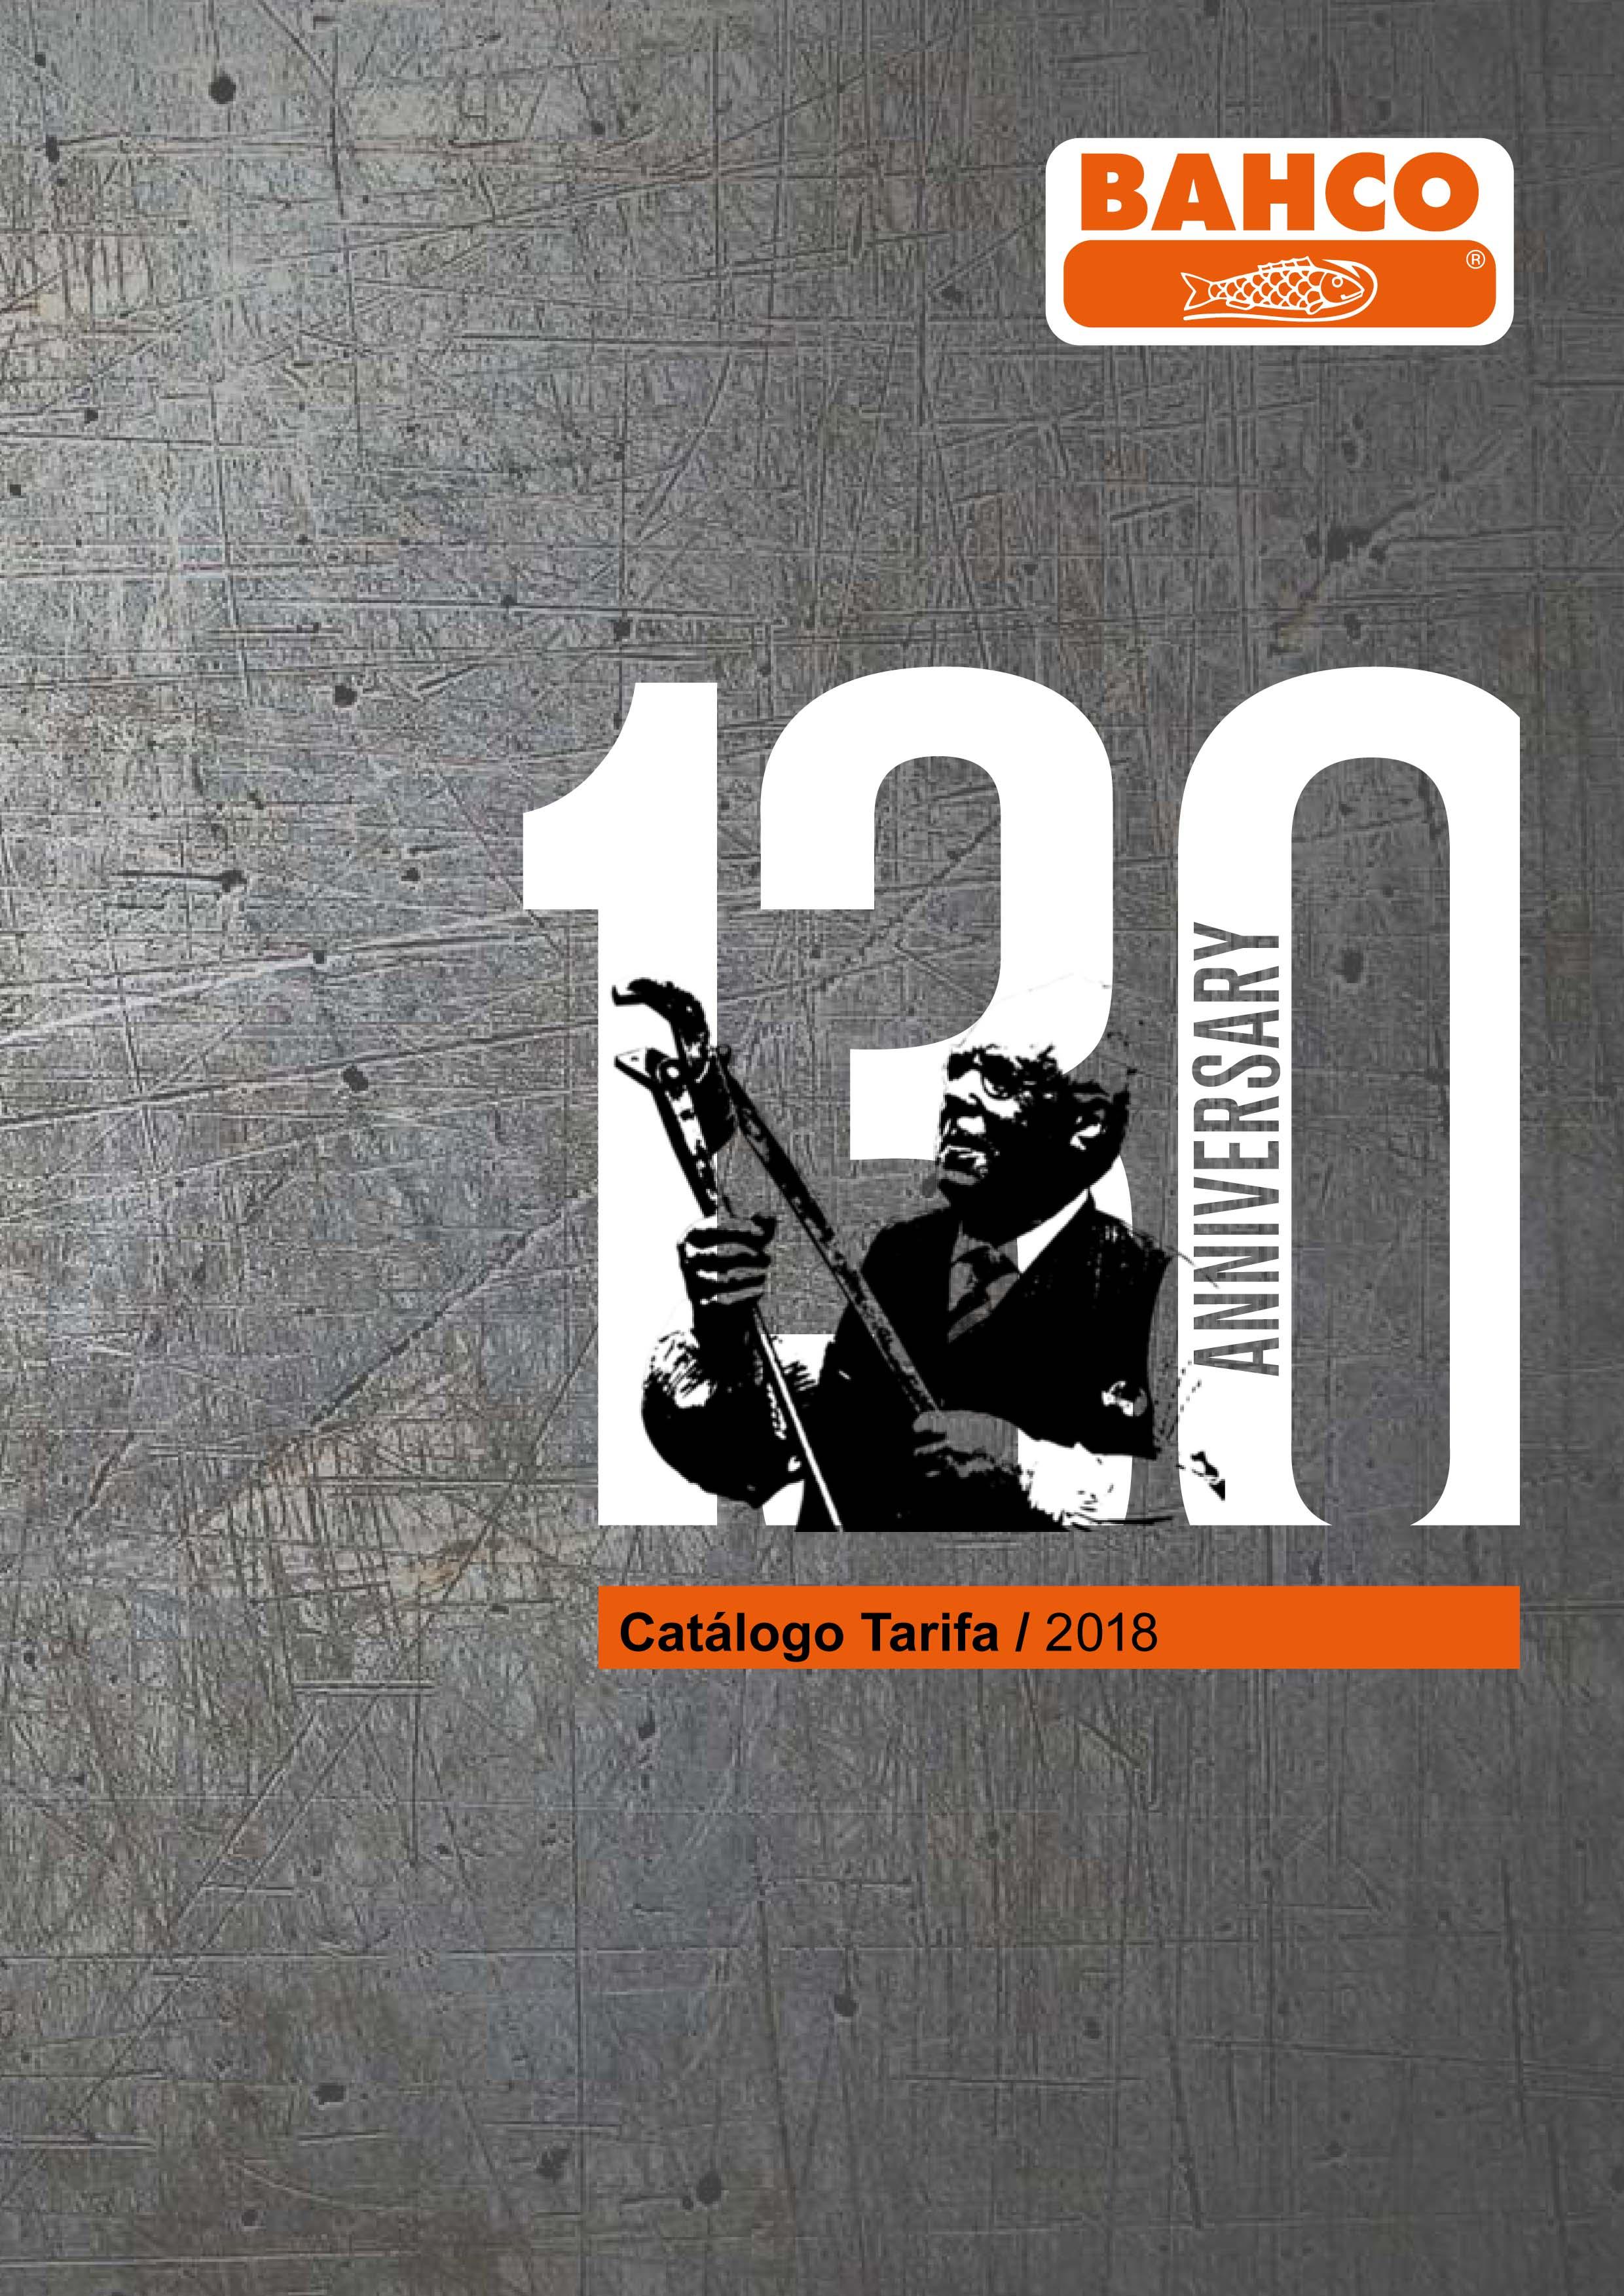 Catálogo-Tarifa Bahco 2018-1